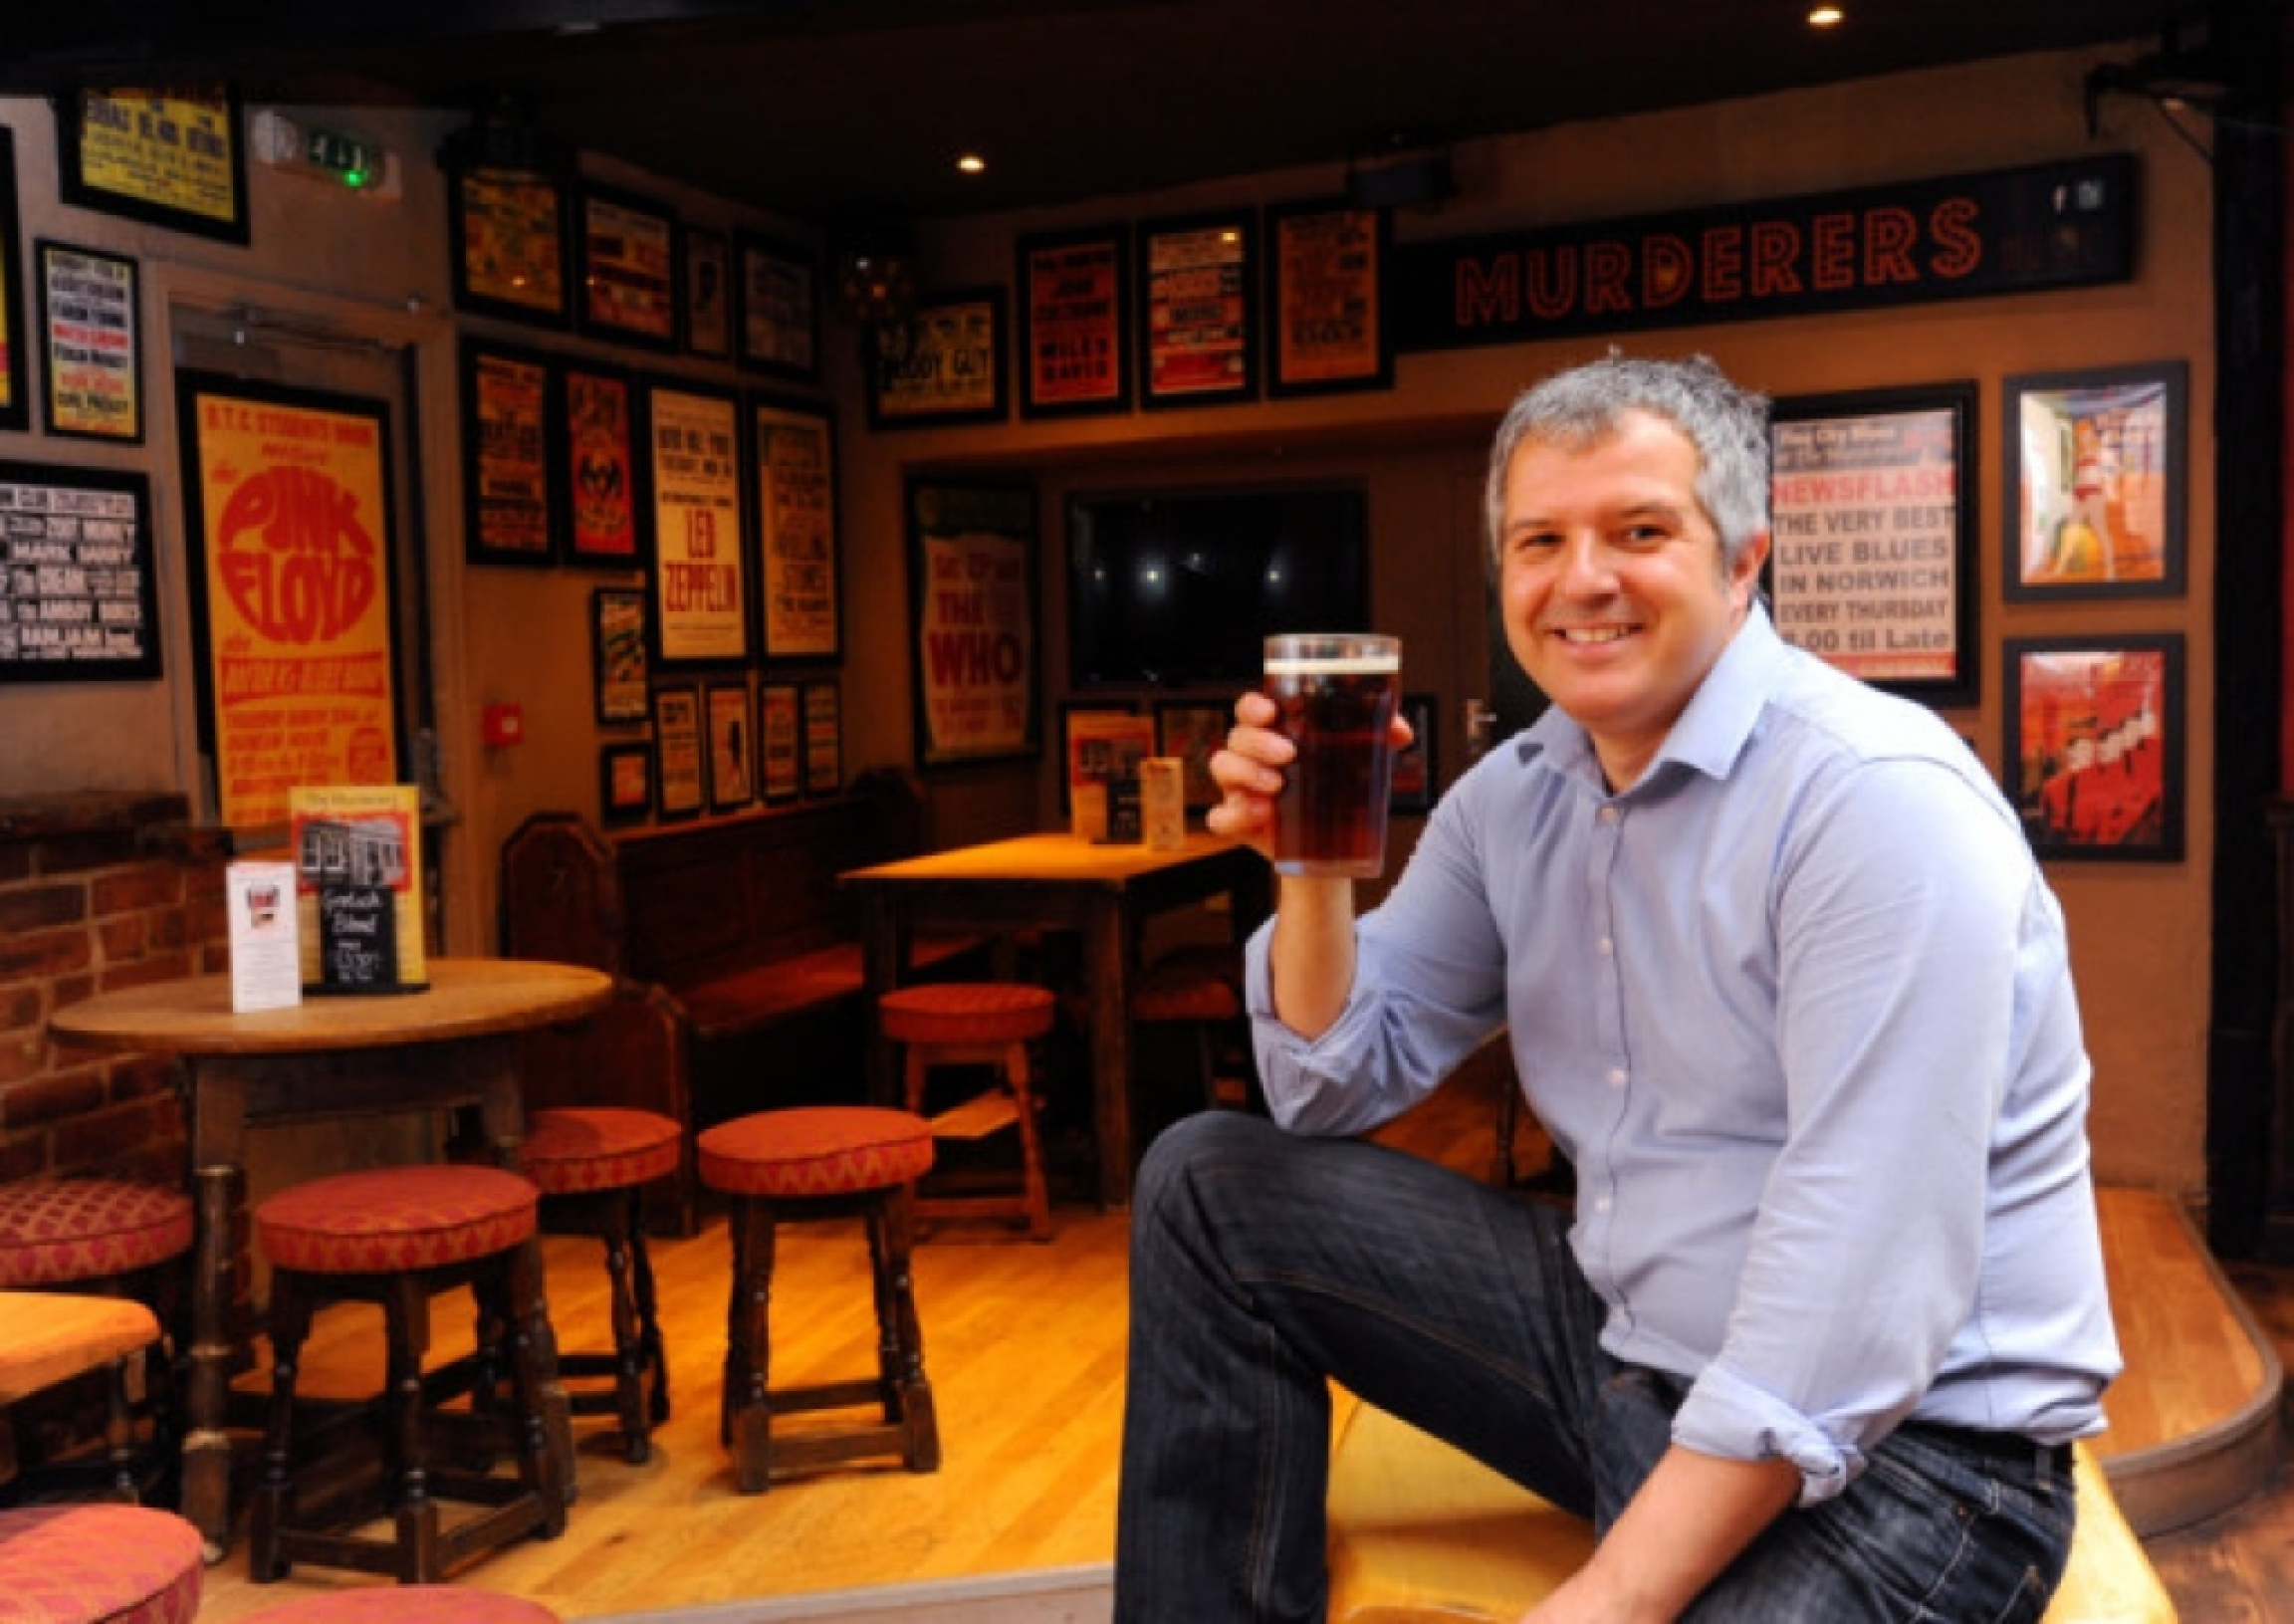 A man enjoys a beer in a pub